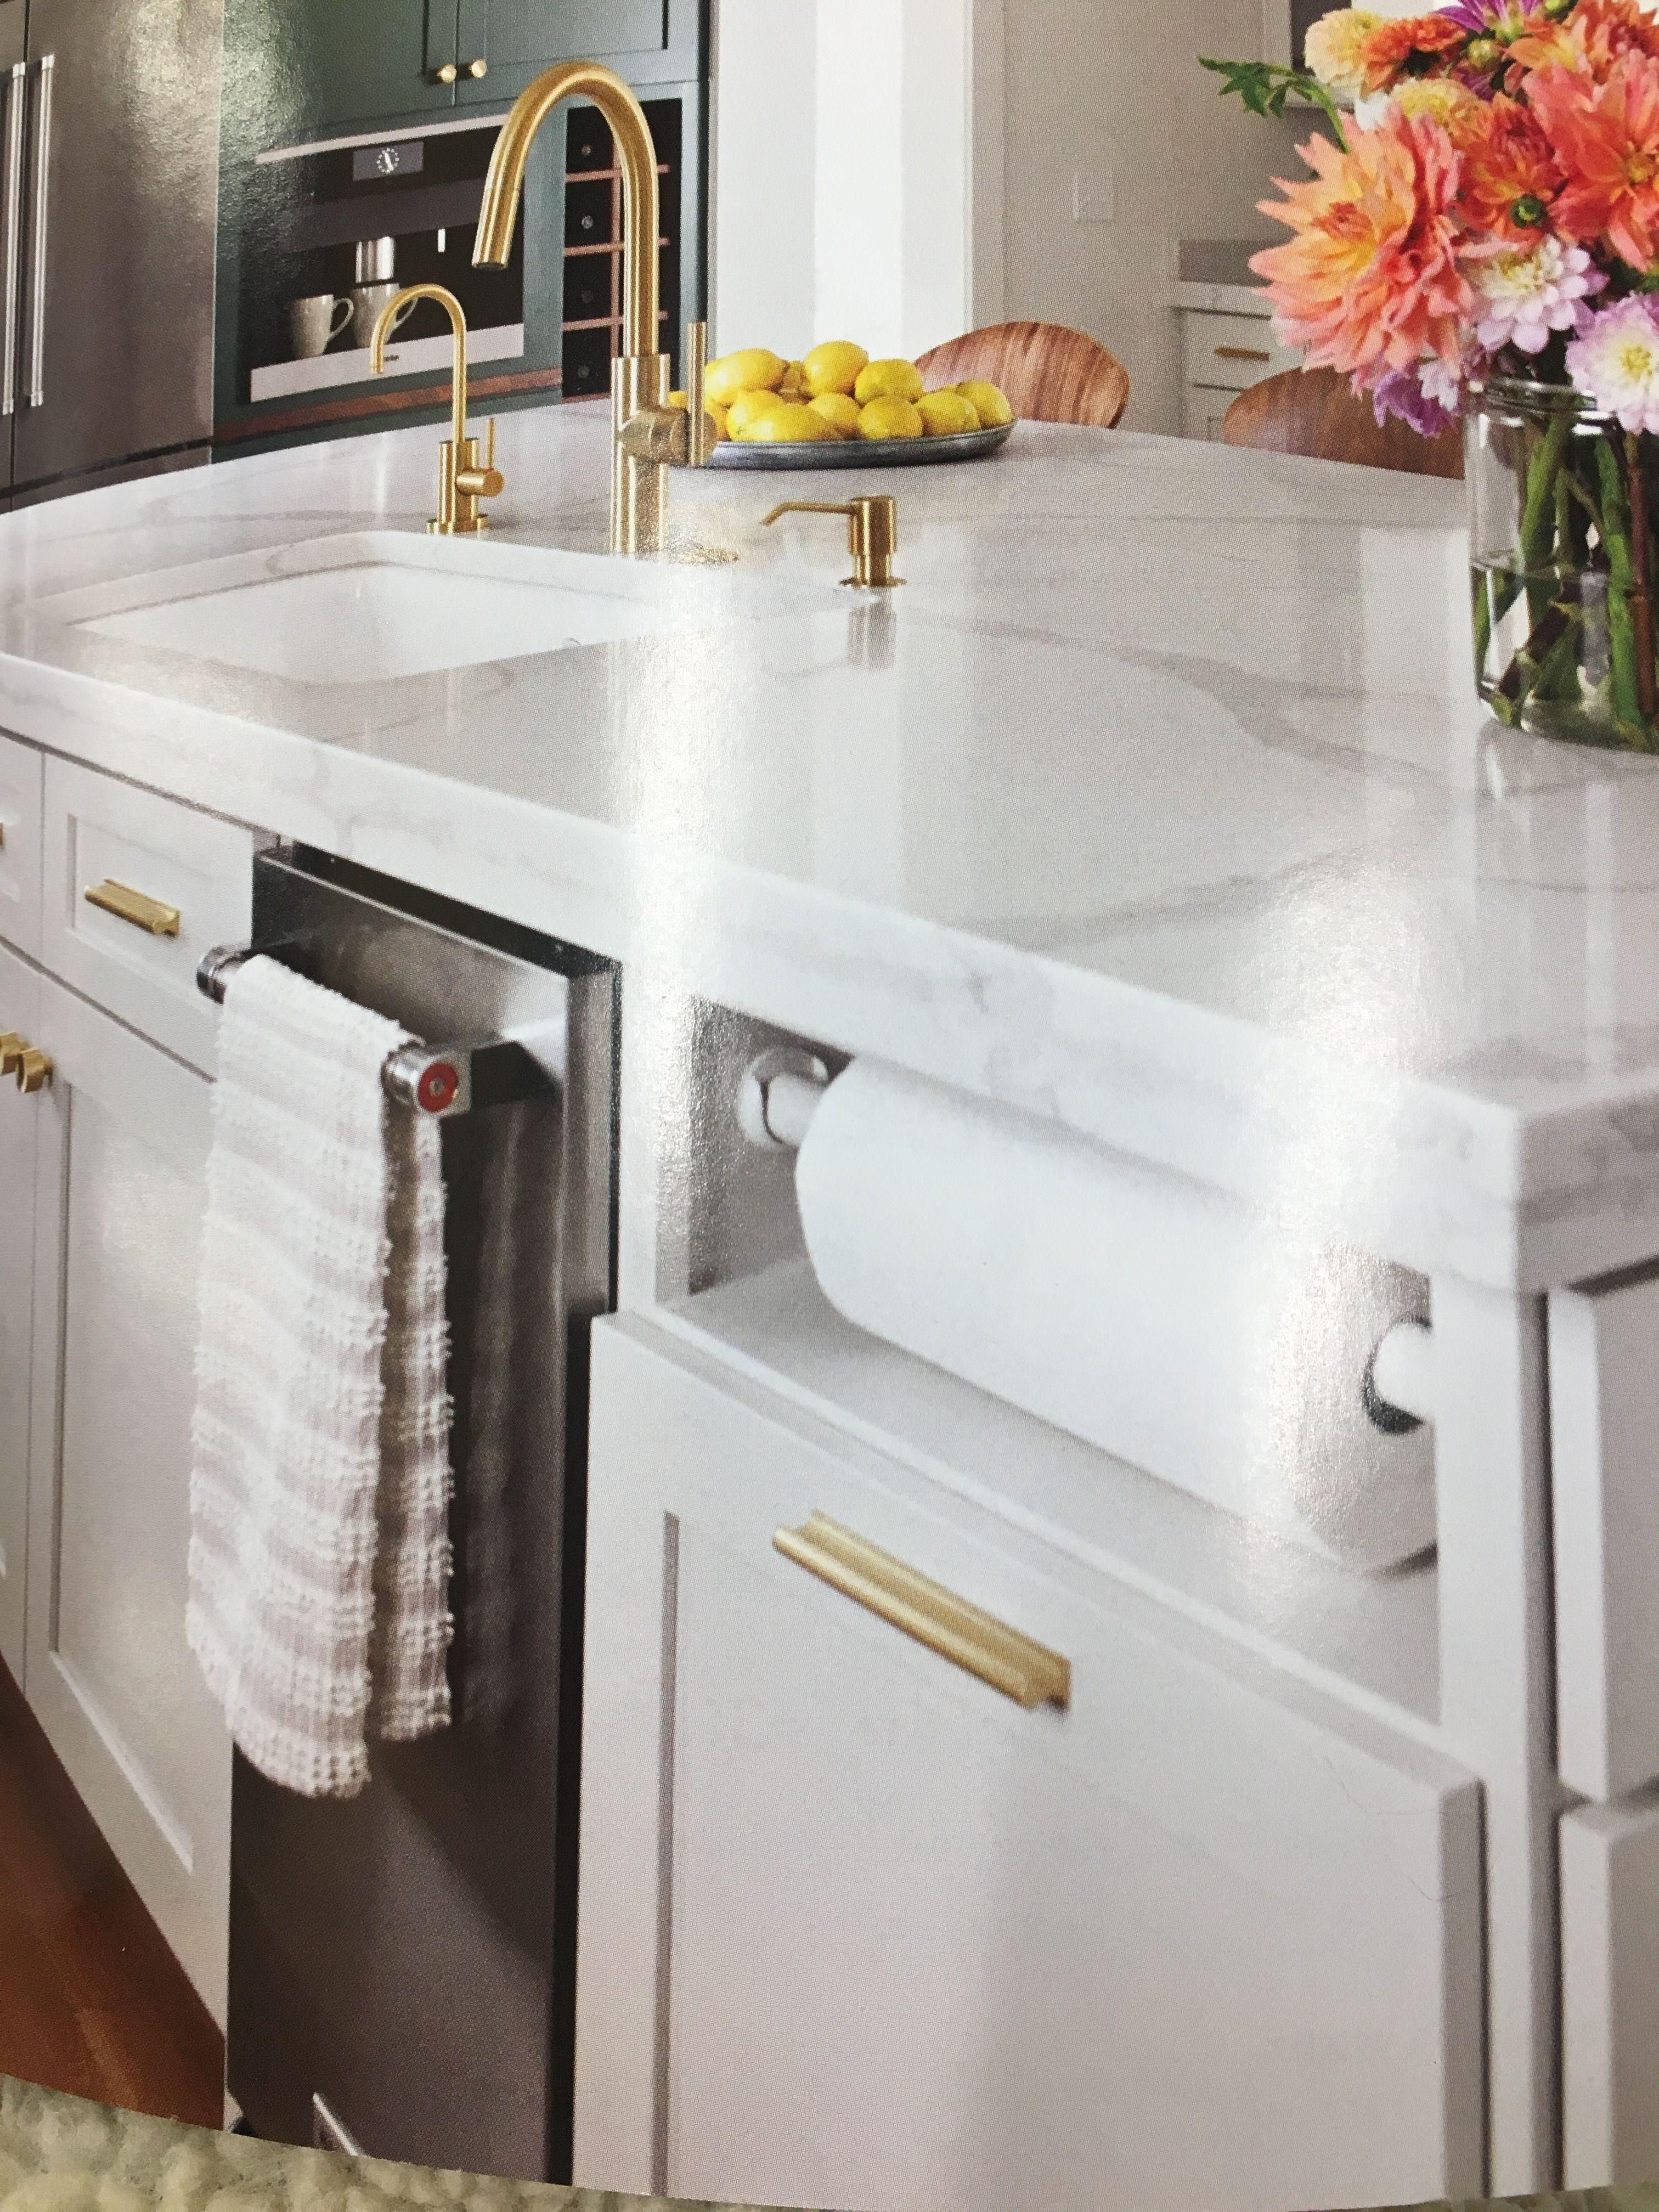 Nice Countertop And Interesting Paper Towel Rack Kitchen Countertops Towel Rack